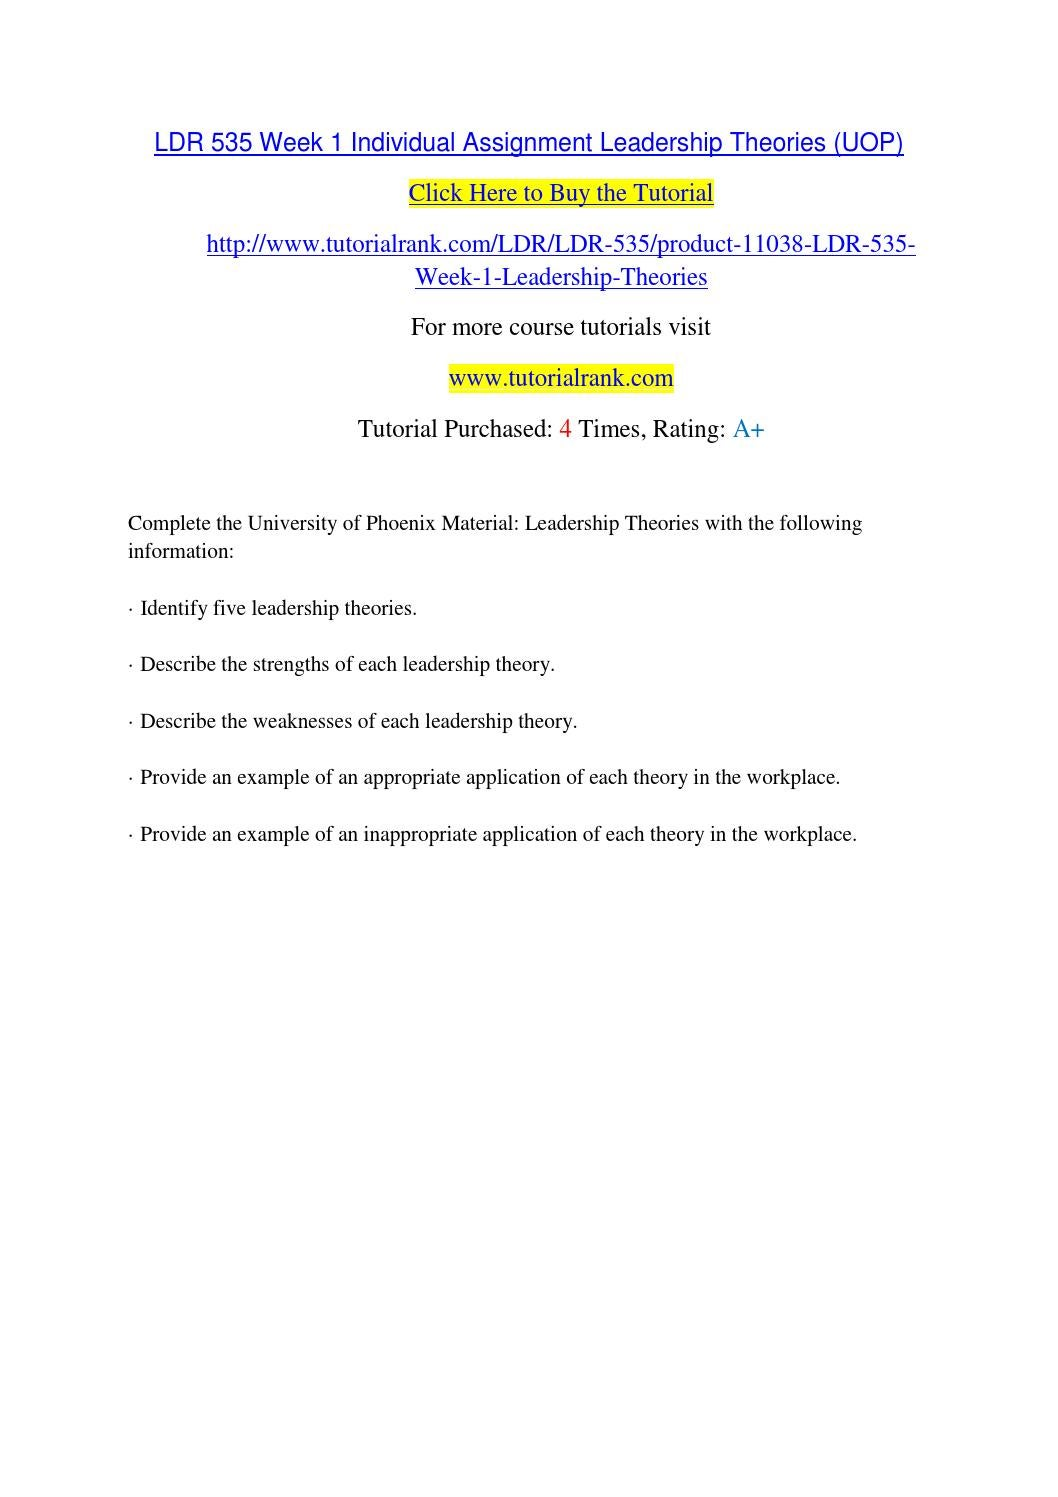 LDR 531 Final Exam Questions & Answers, Organizational Leadership / Momentum LDR 531